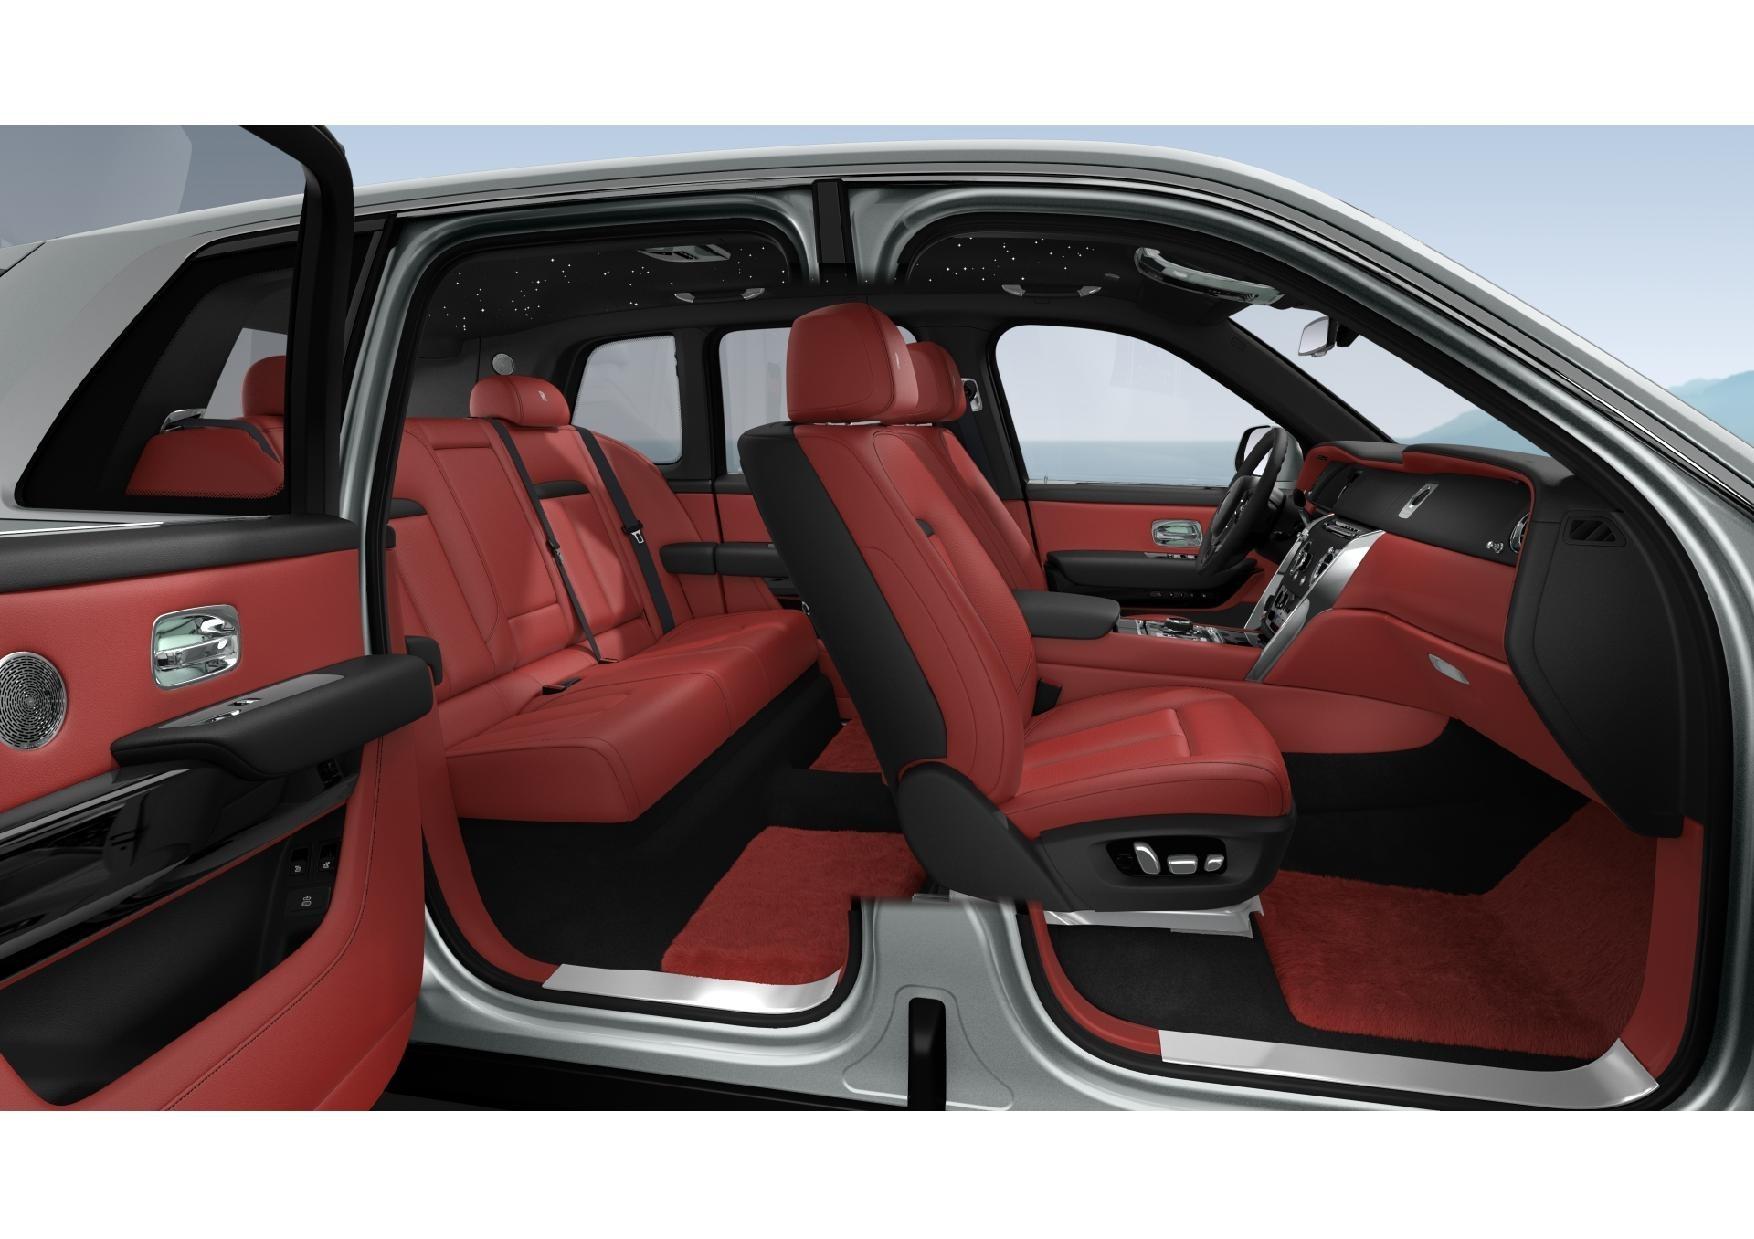 New-2021-Rolls-Royce-Cullinan